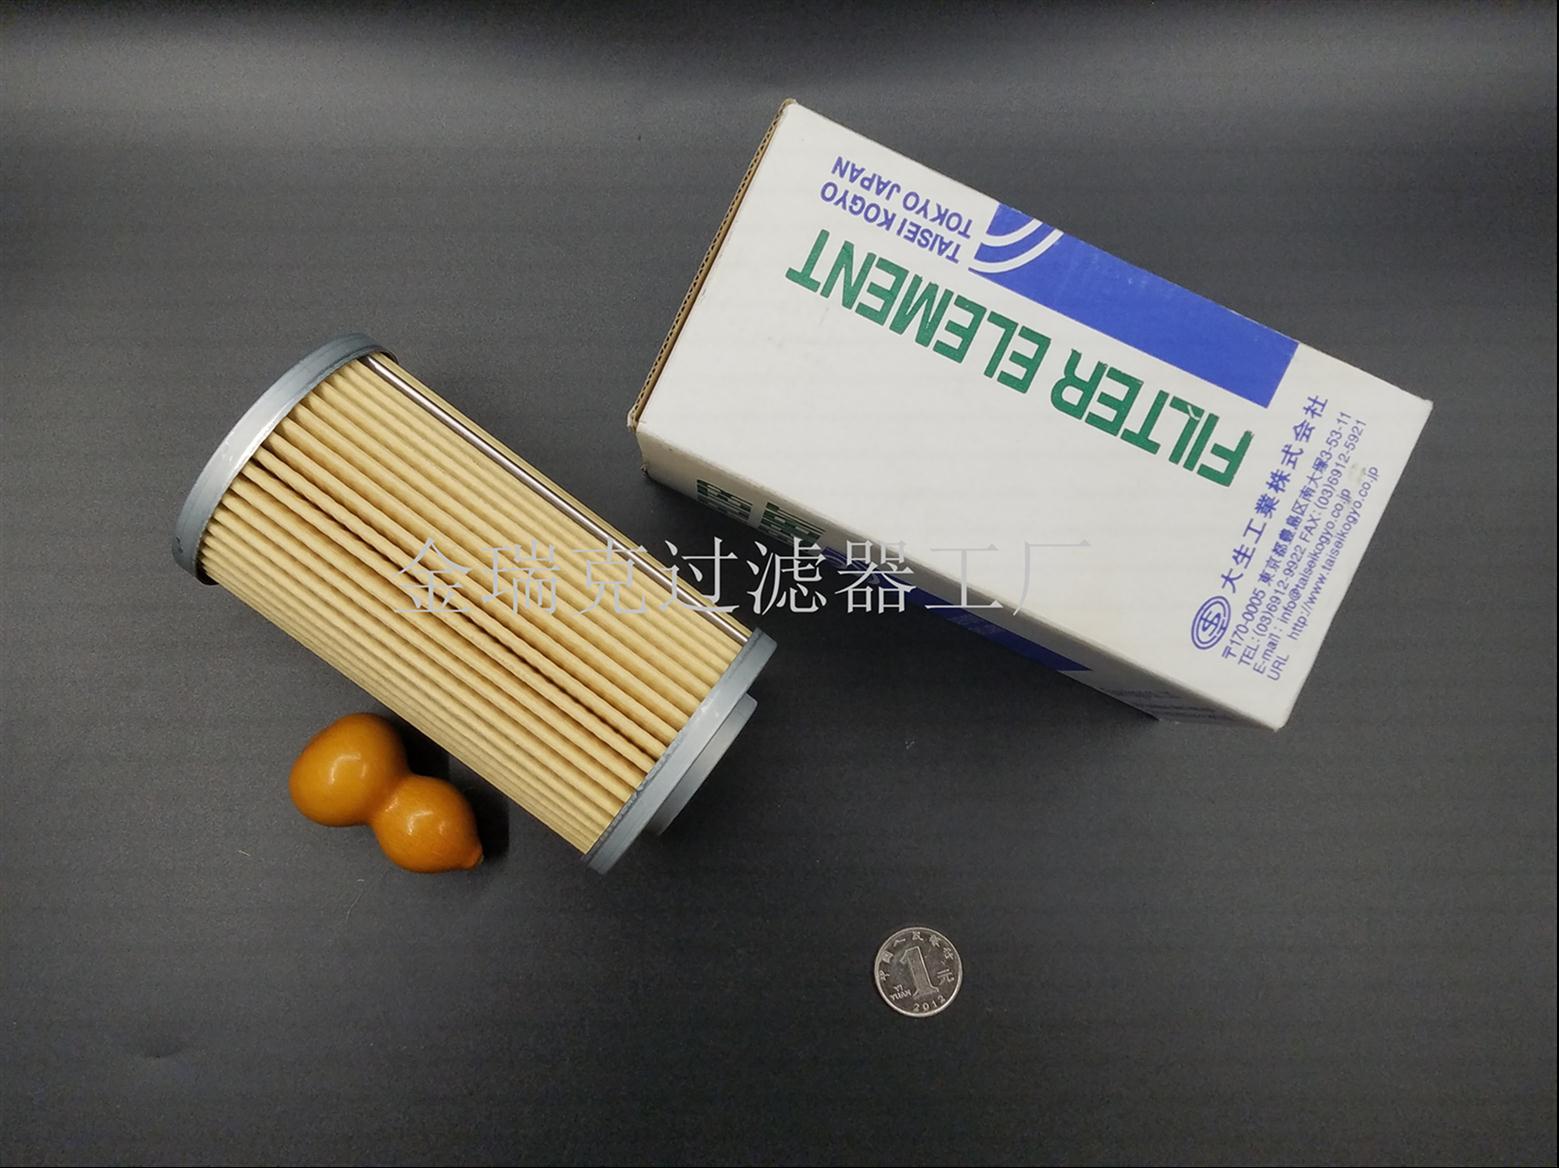 HITACHI 4388086压缩机/空调滤芯空气过滤器